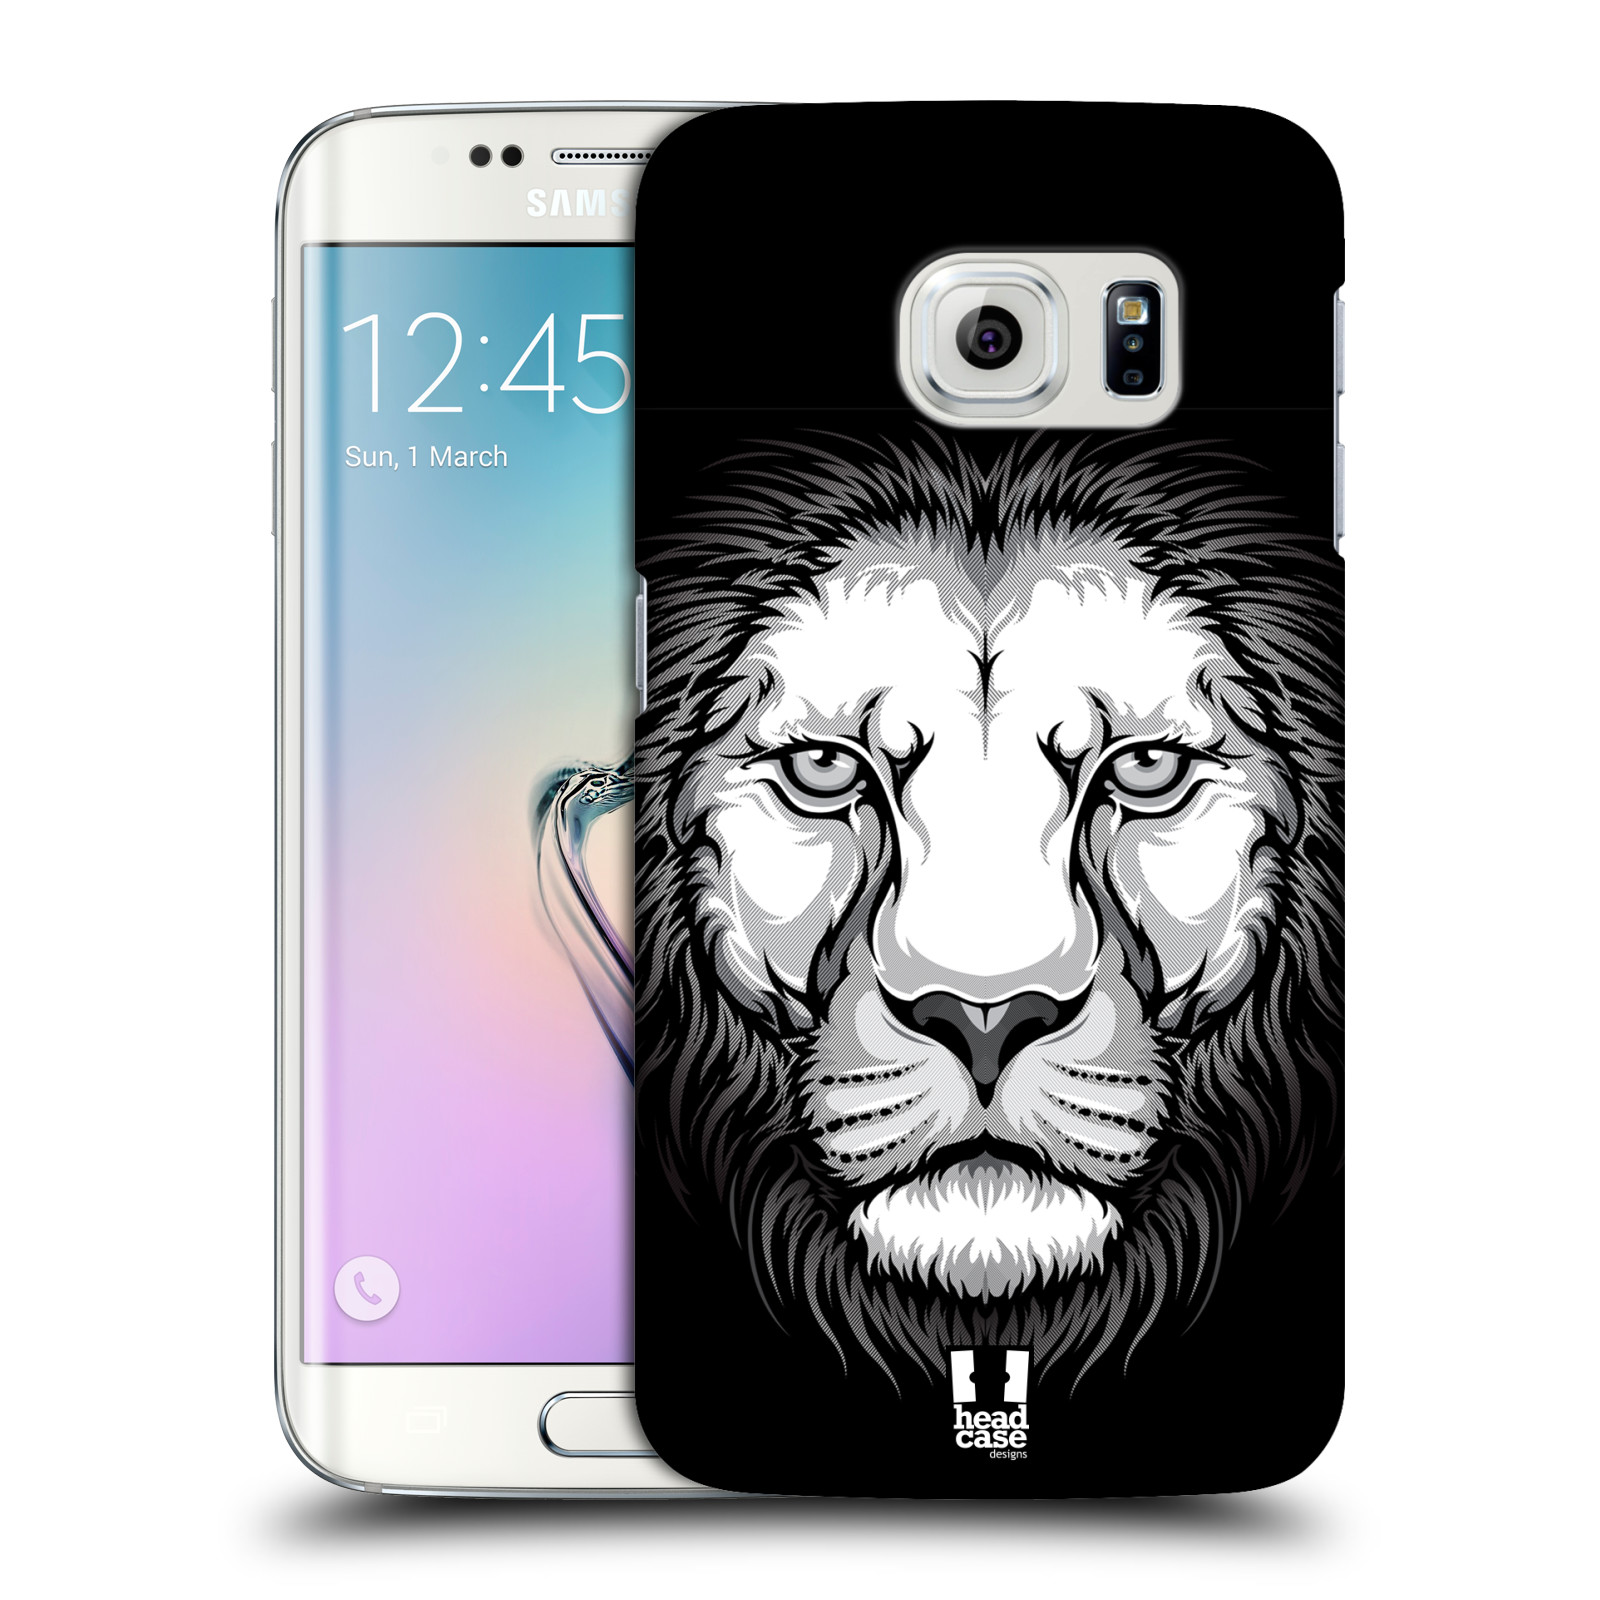 HEAD CASE plastový obal na mobil SAMSUNG Galaxy S6 EDGE (G9250, G925, G925F) vzor Zvíře kreslená tvář lev